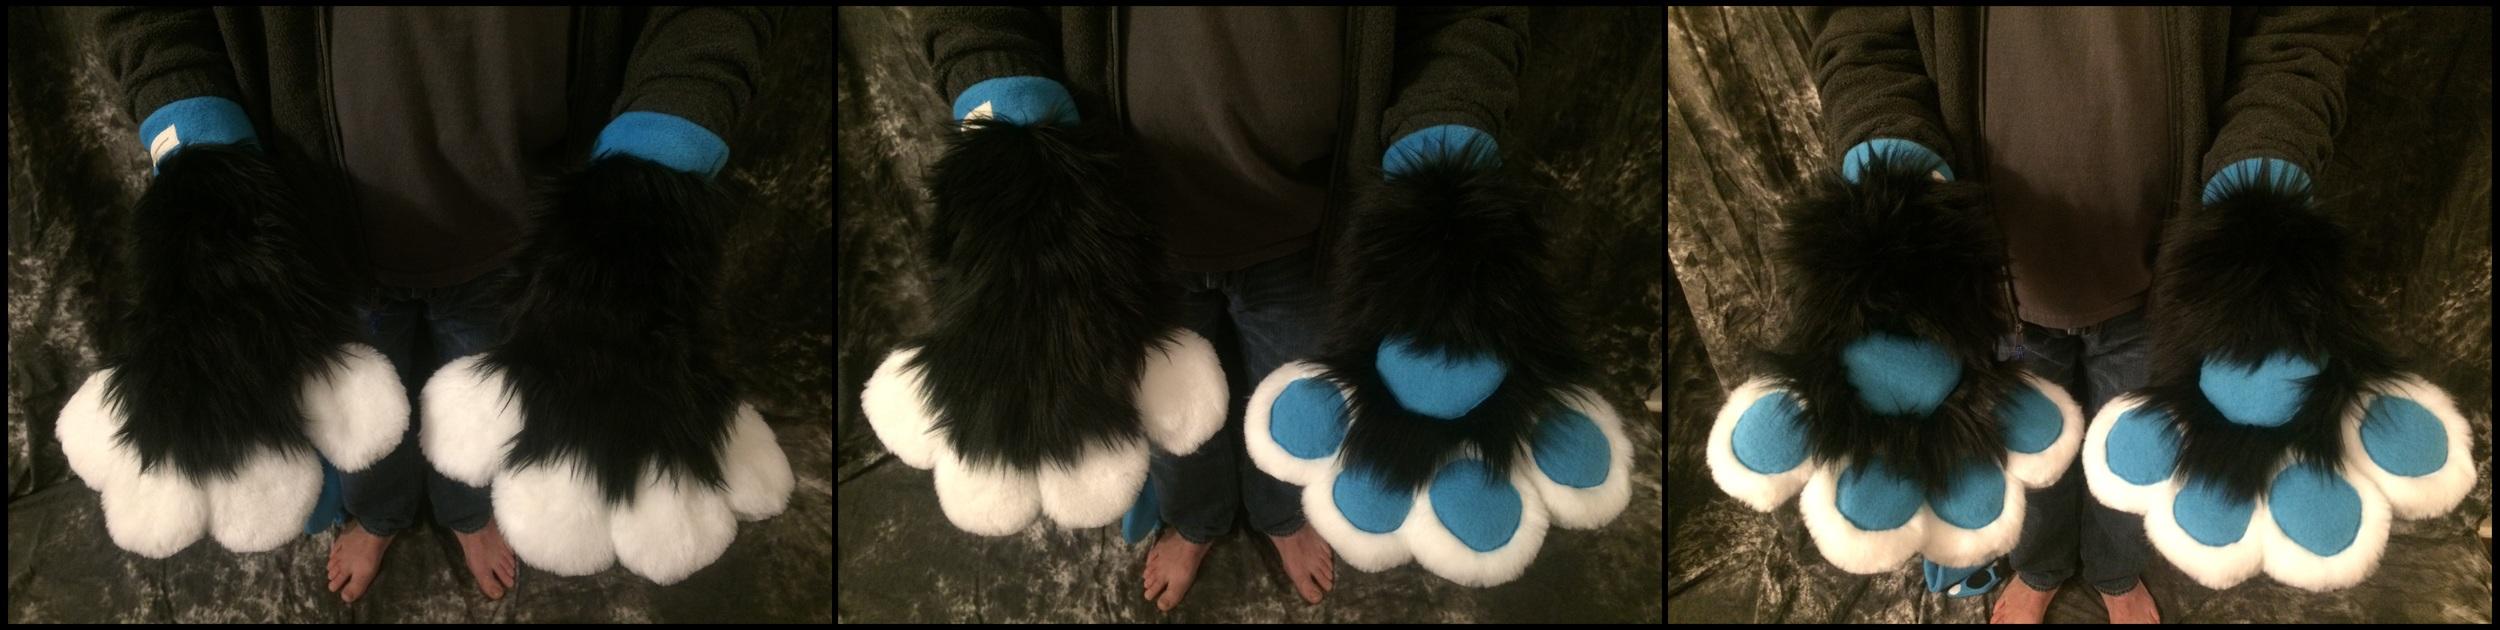 crowsephh tail.jpg